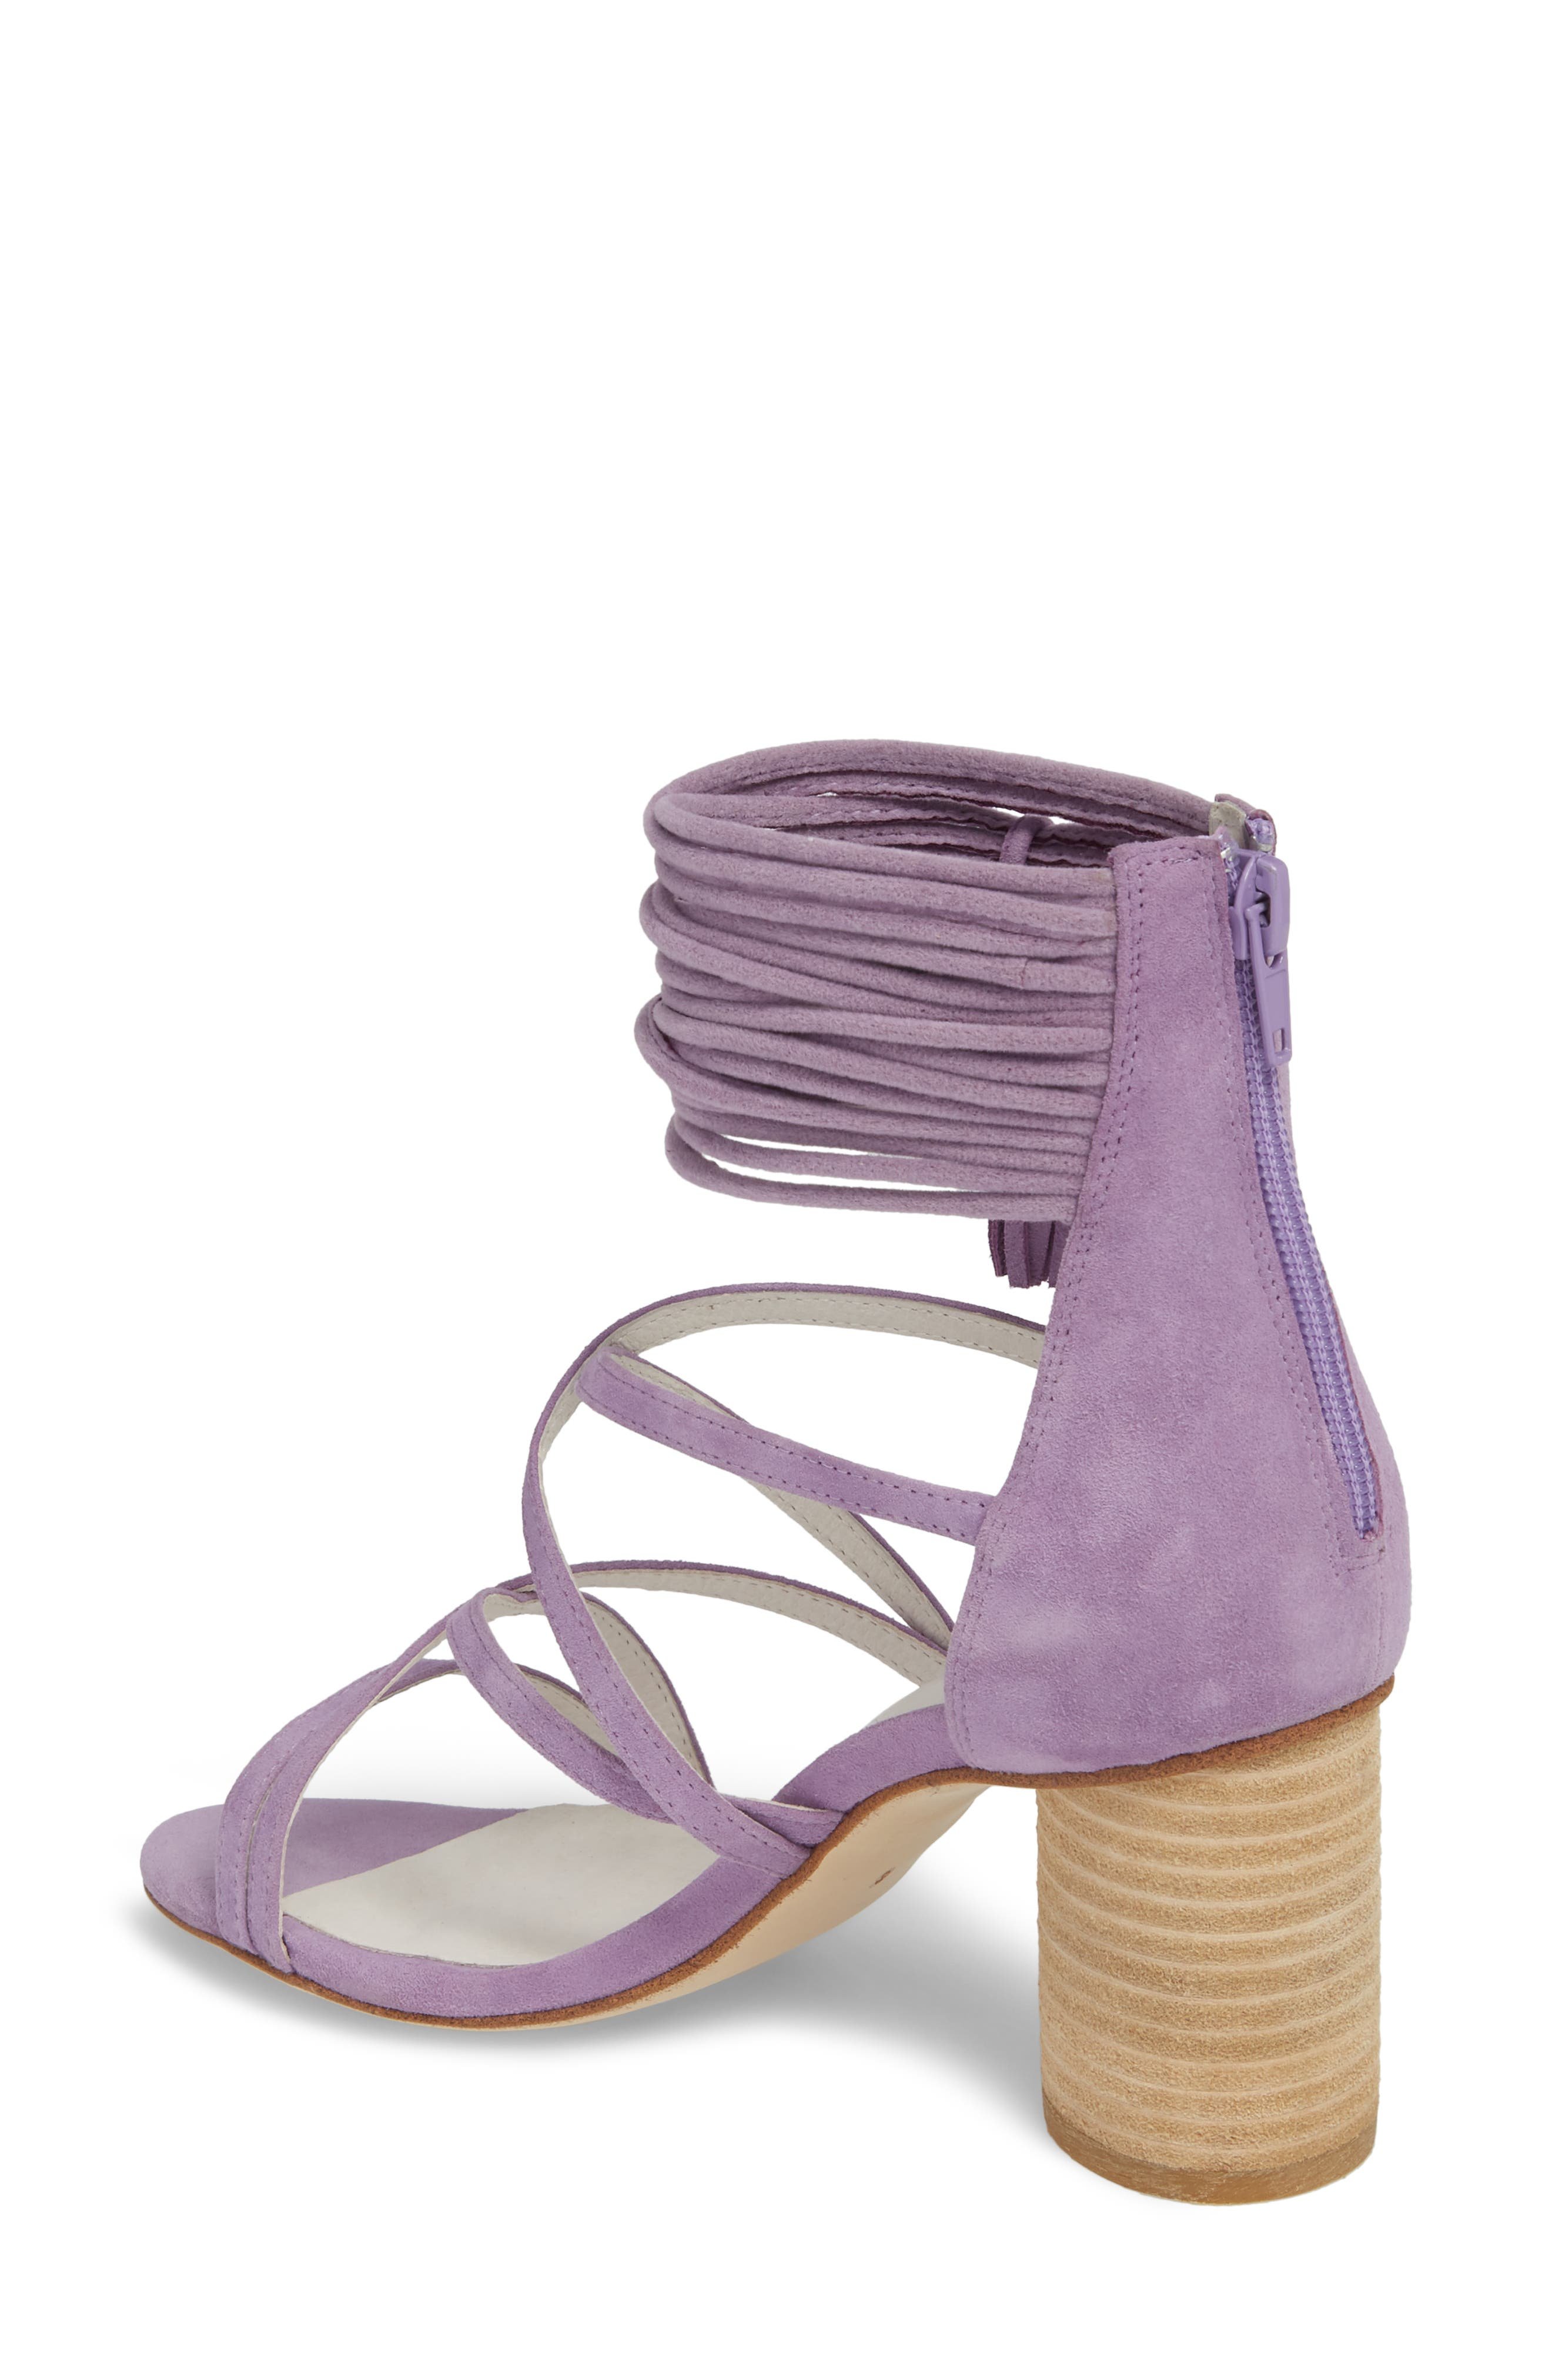 'Despina' Strappy Sandal,                             Alternate thumbnail 8, color,